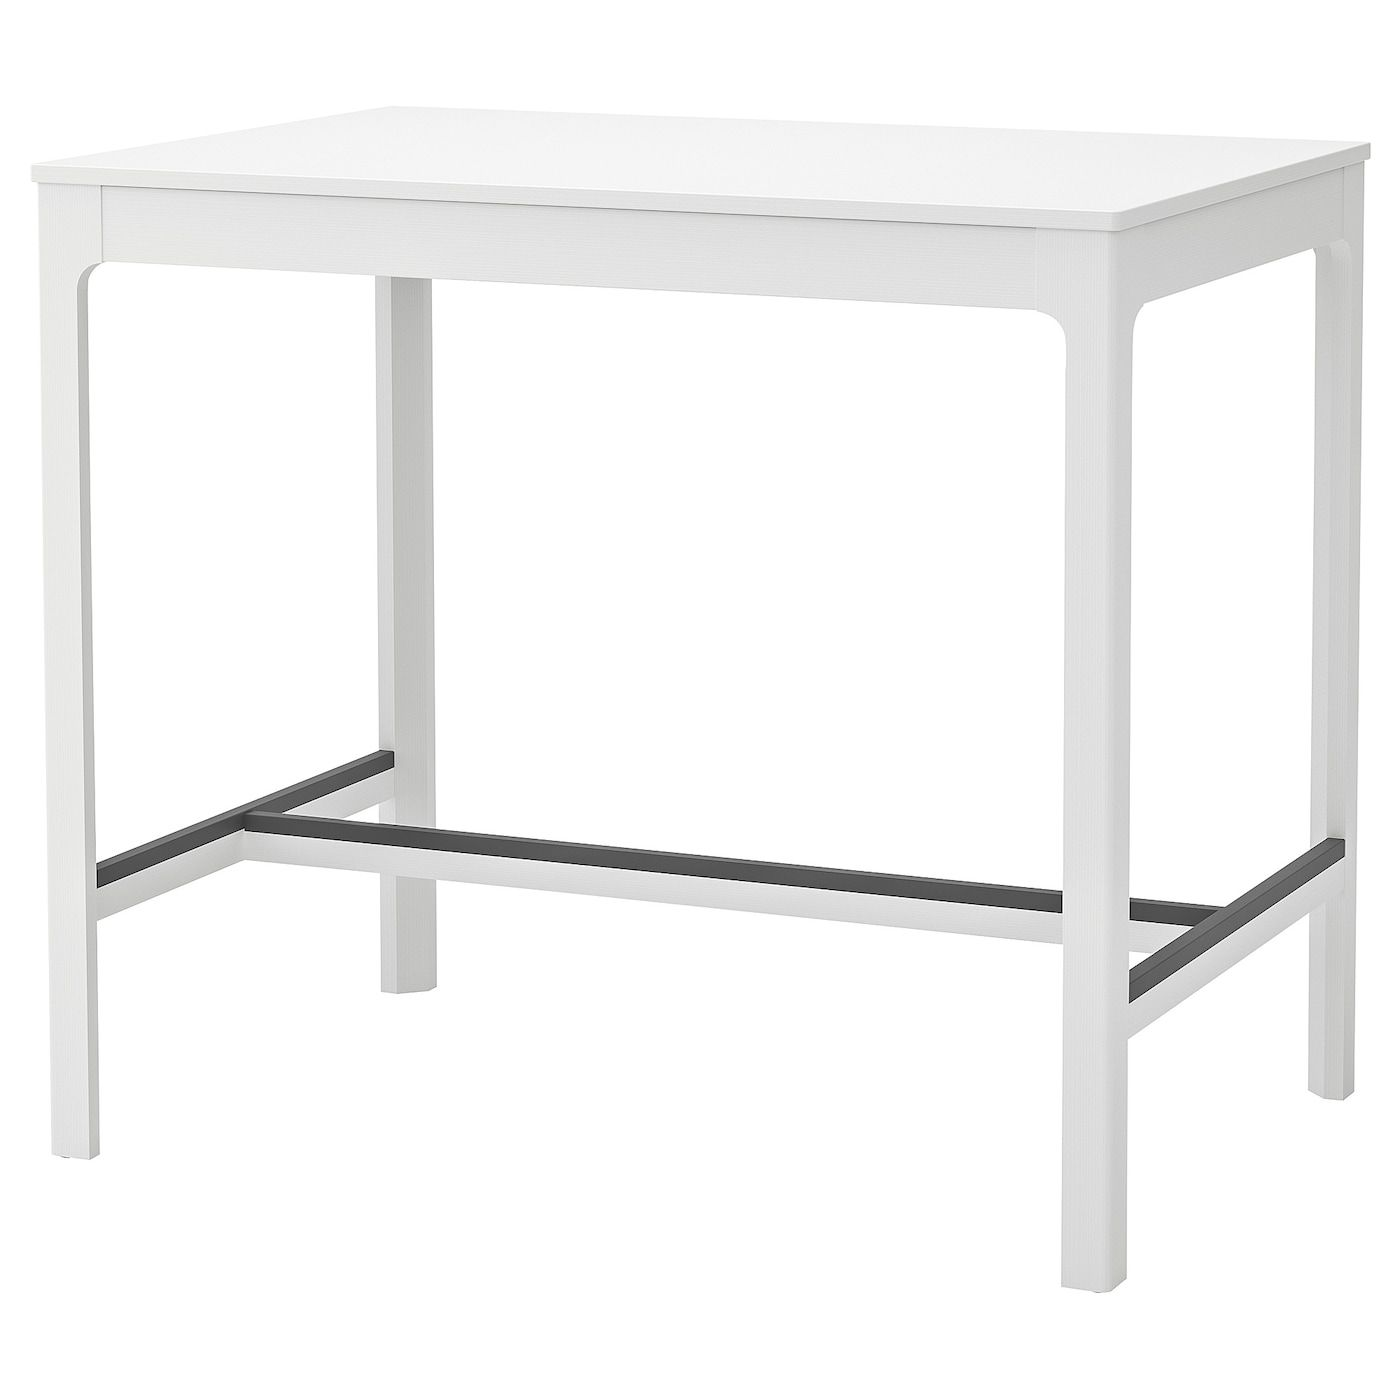 Ekedalen Bar Table White 47 1 4x31 1 2 White Bar Table Bar Table Ikea Ikea Bar